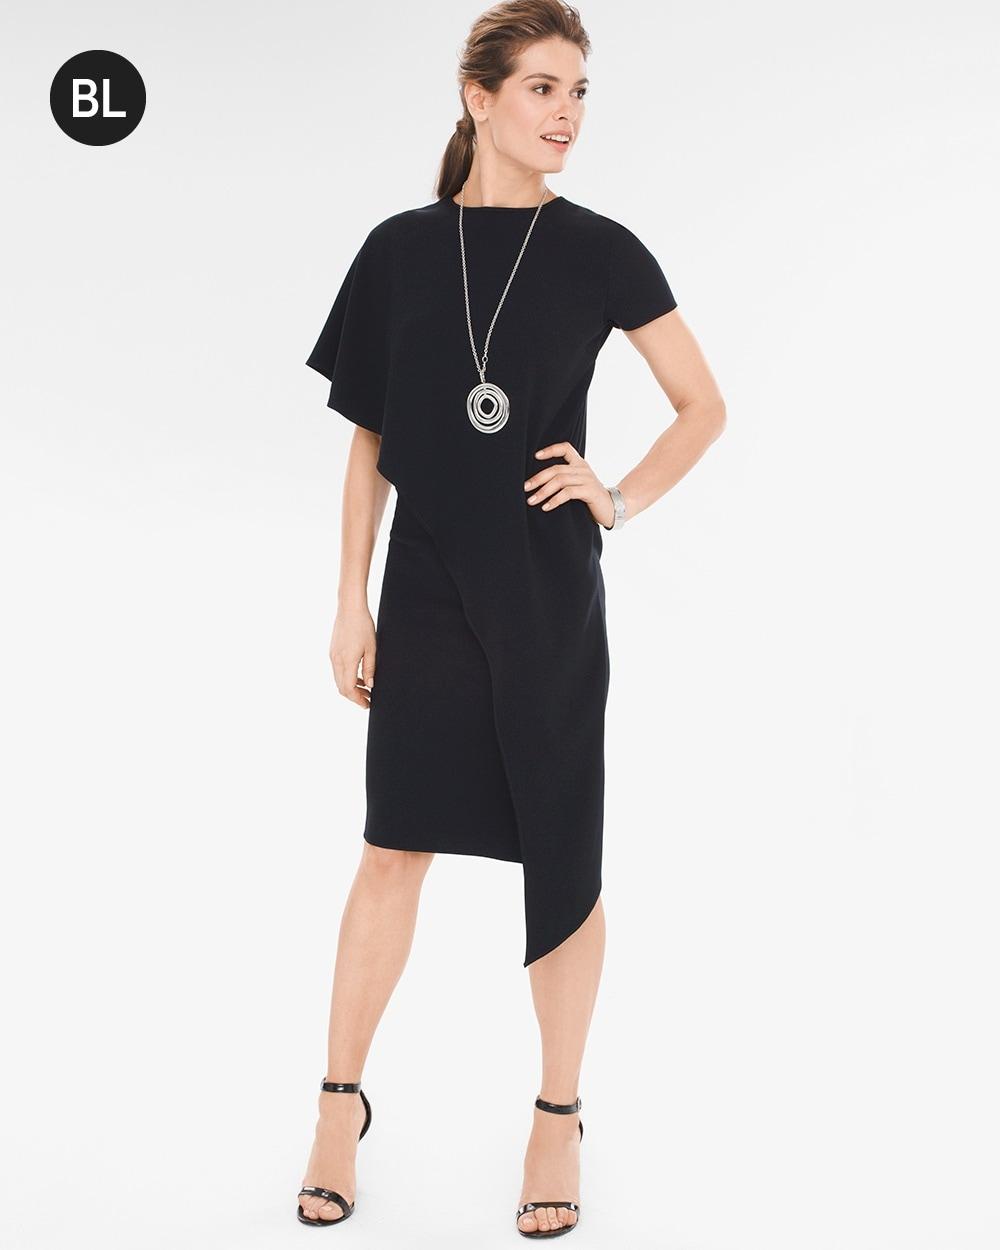 9b7fdd05fcd89 Layered Flounce Dress